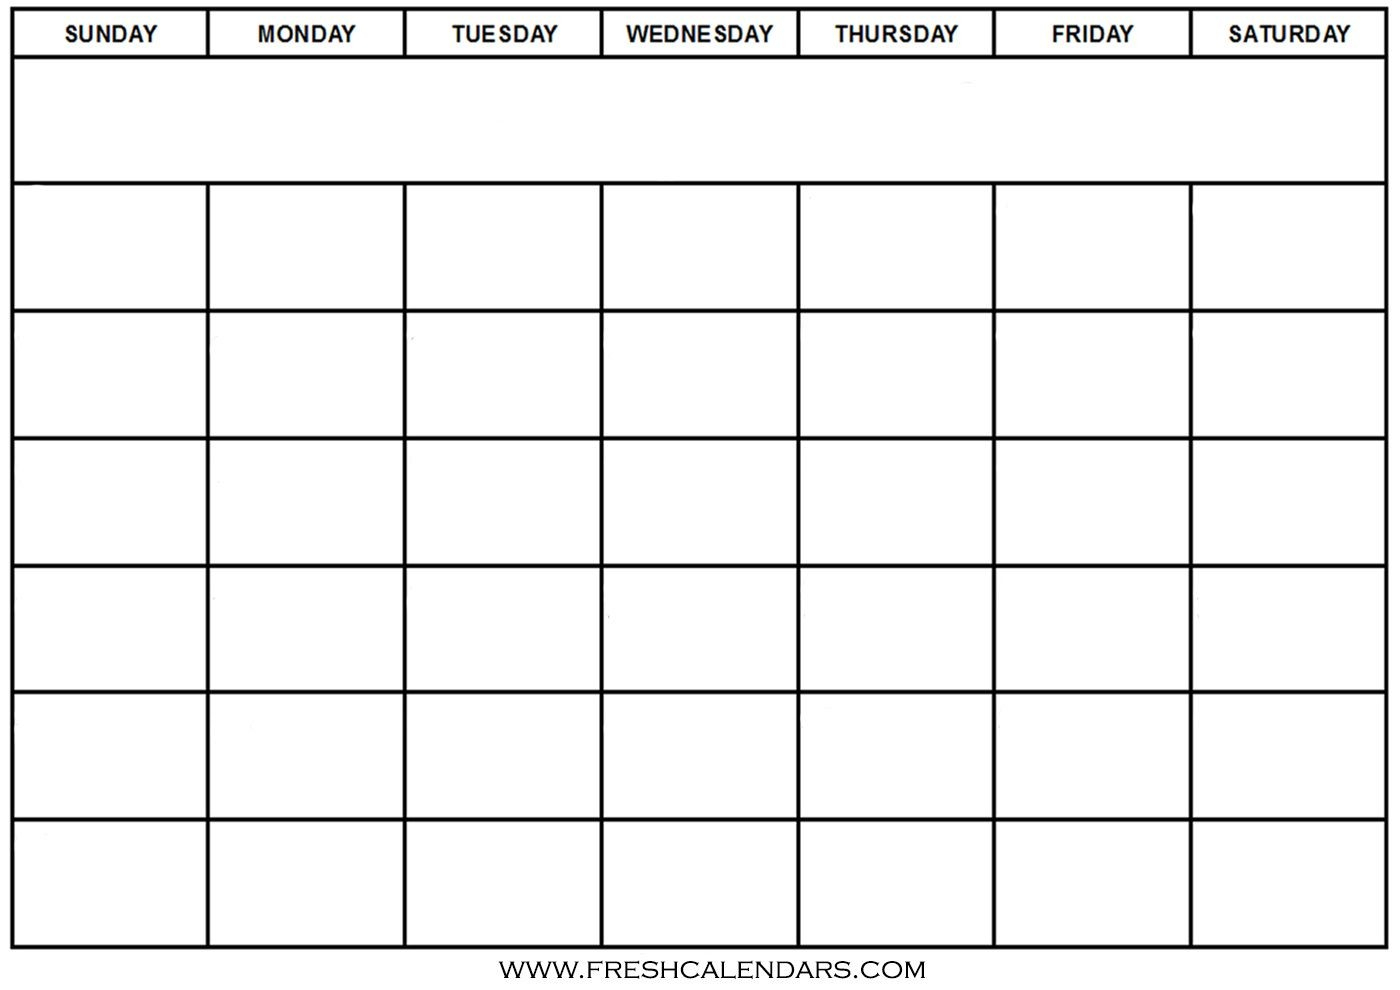 Calendar Template Free Printable Blank Calendar Wonderfully with regard to Free Blank Calendar Sheets